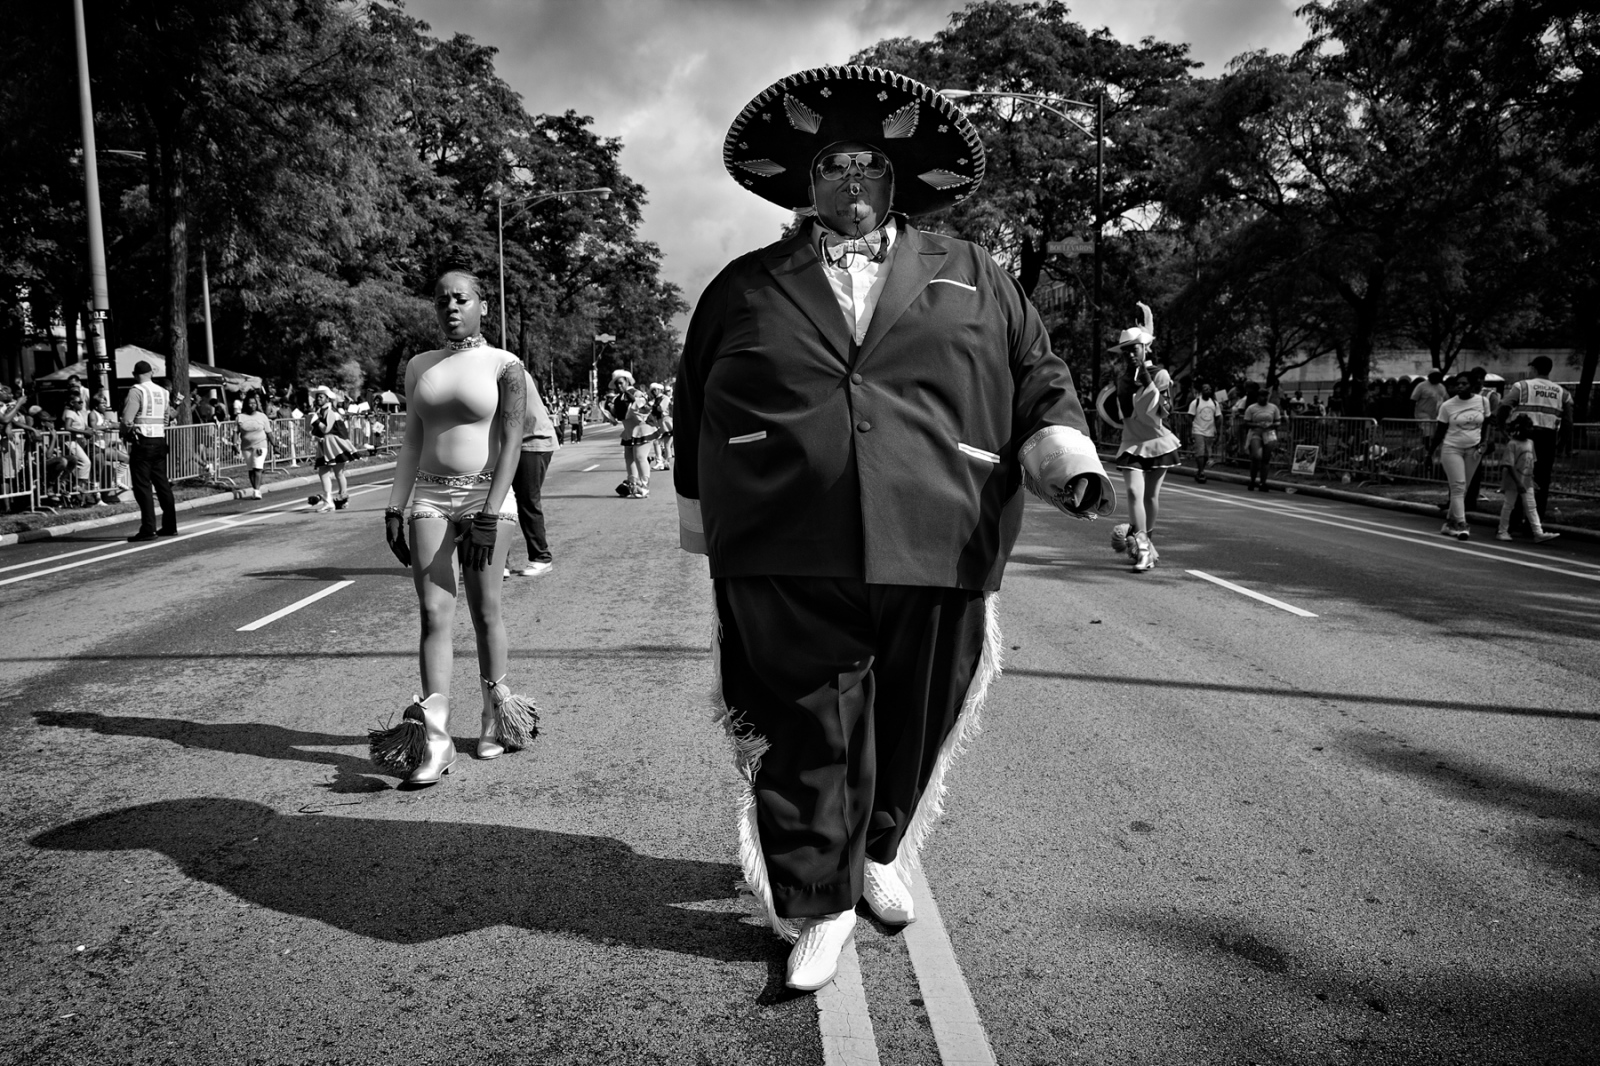 Art and Documentary Photography - Loading New_Budbilliken_Edit.06.JPG